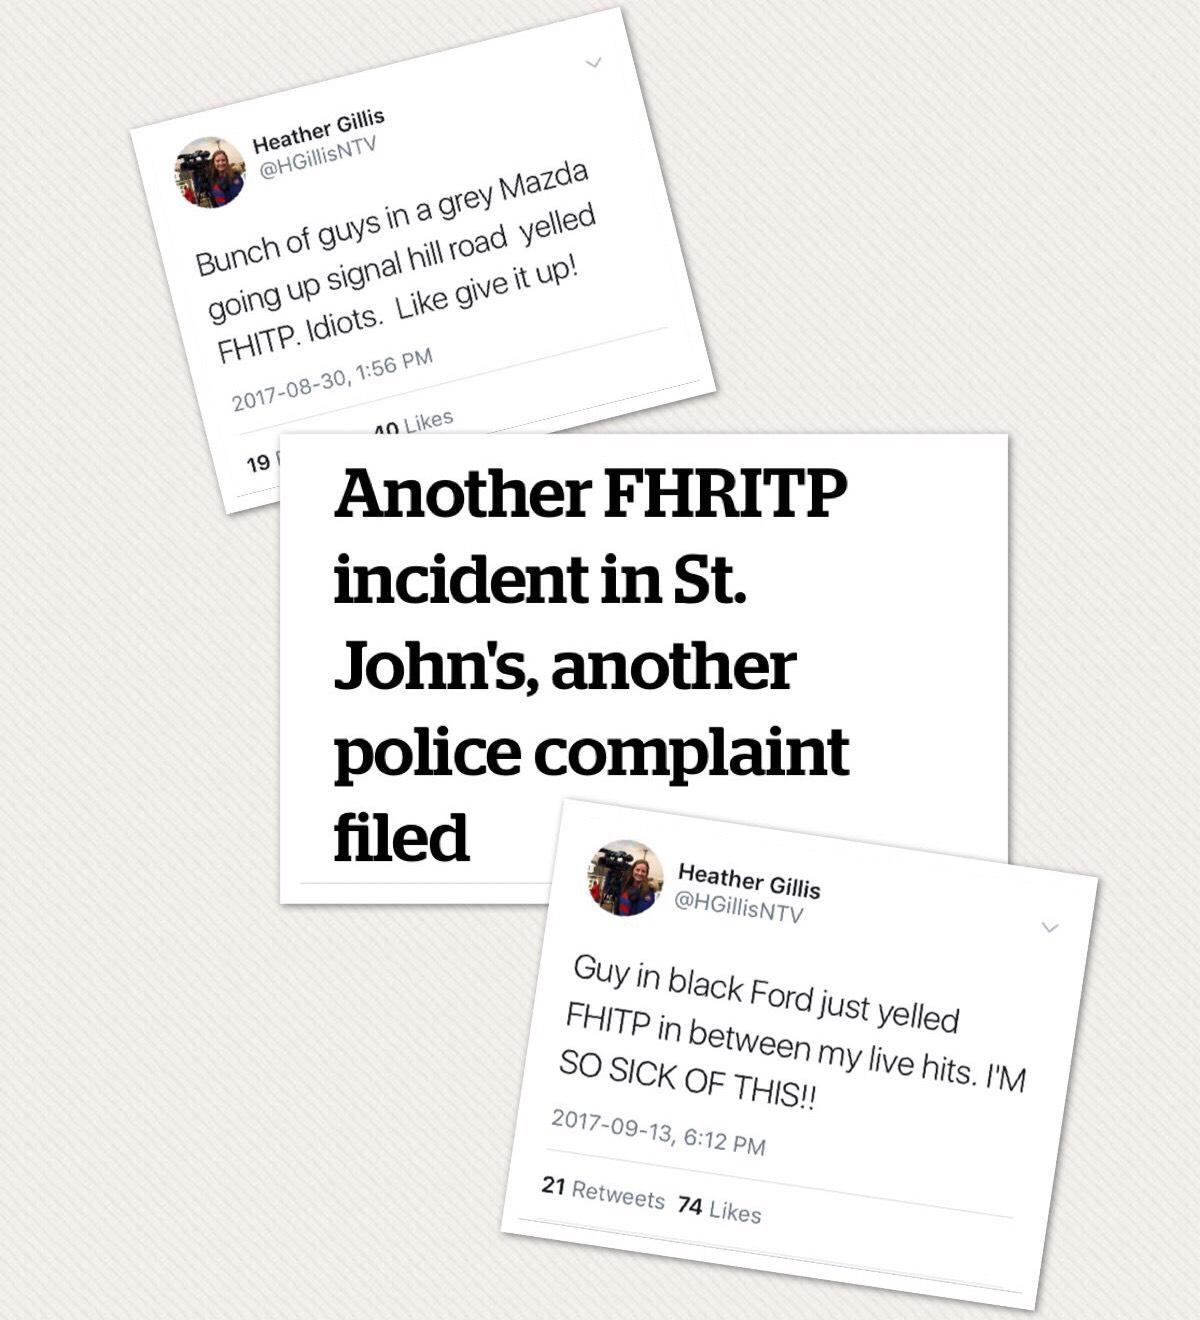 FHRITP